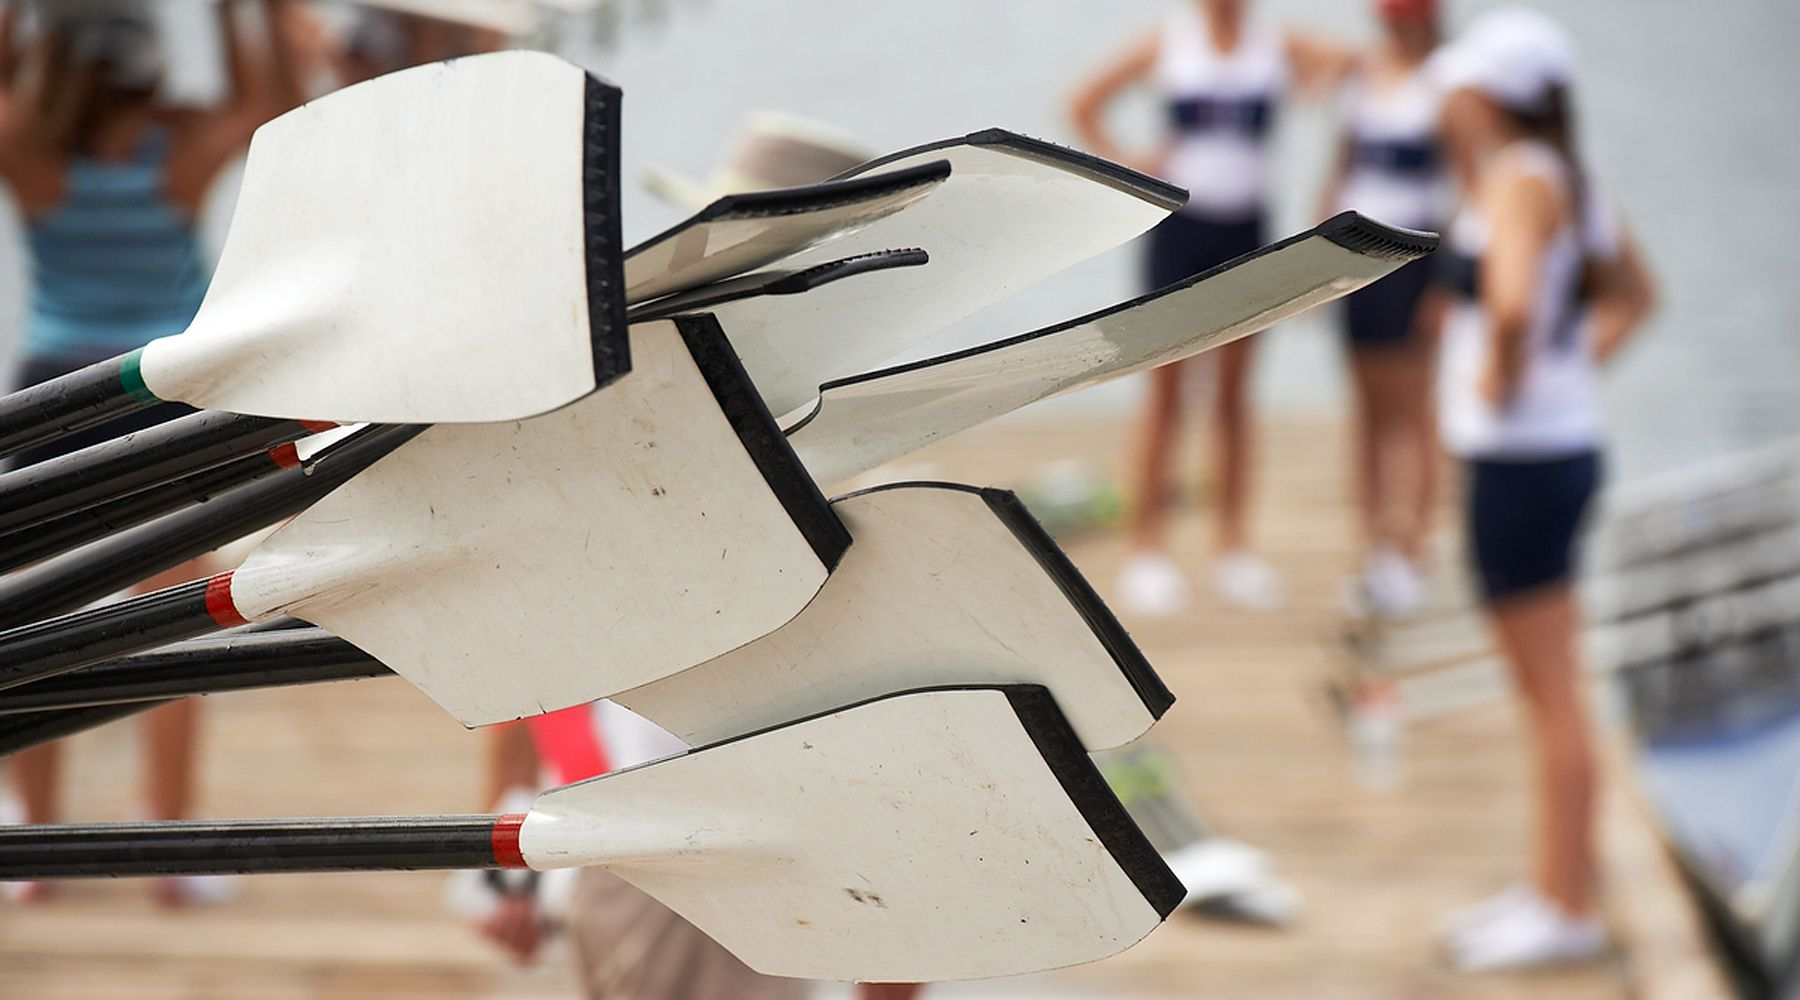 Blades-and-athletes.jpg